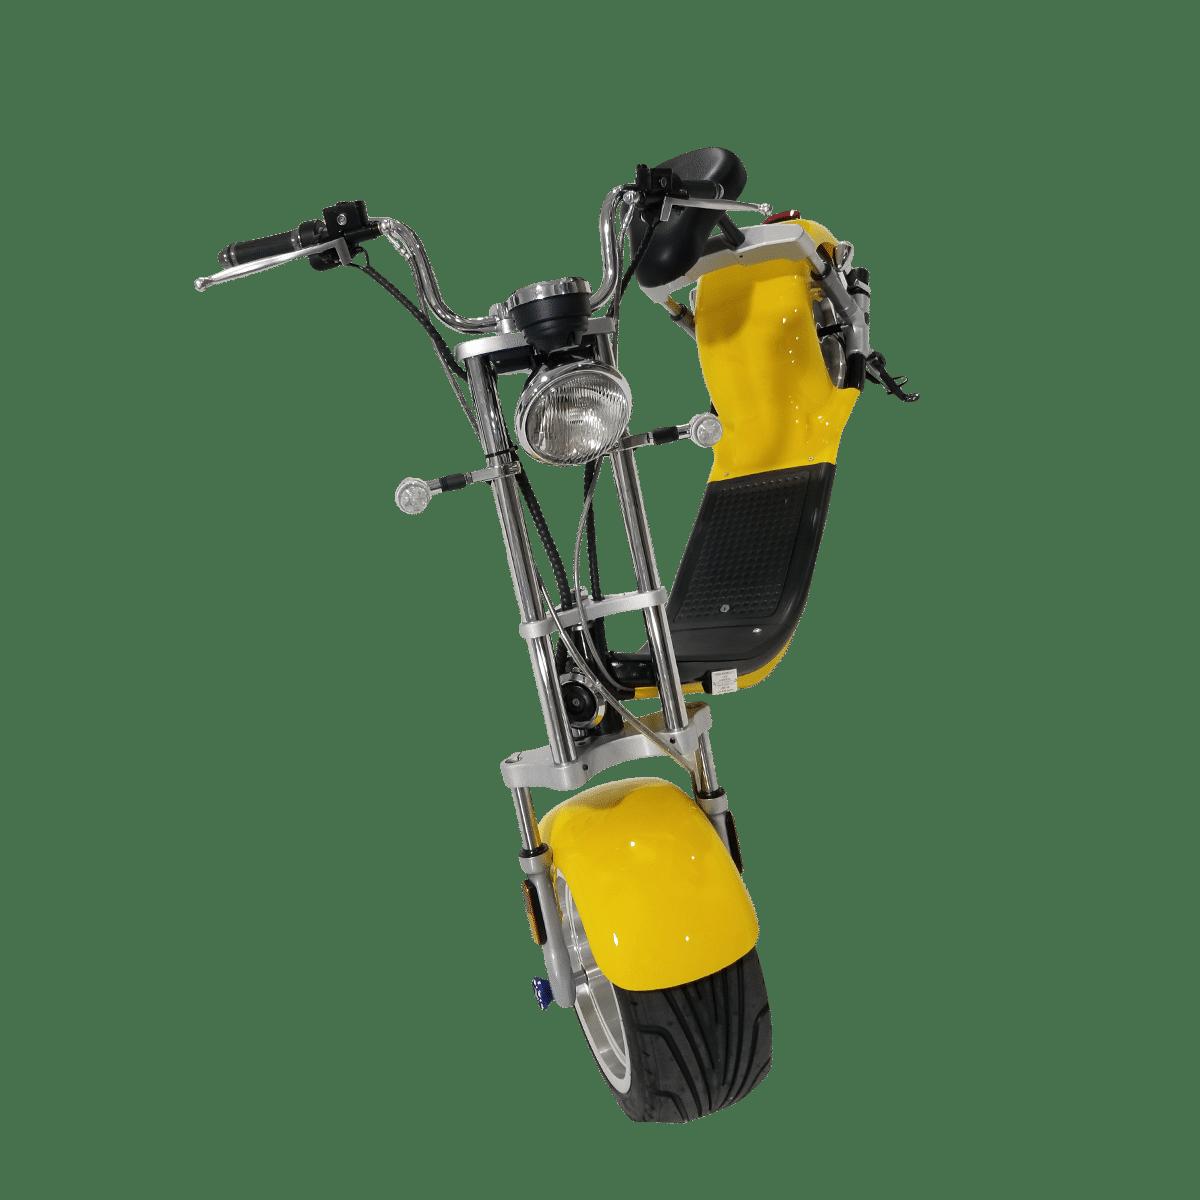 Citycoco Harley Deluxe Jaune avec 1 batterie offerte en plus 18